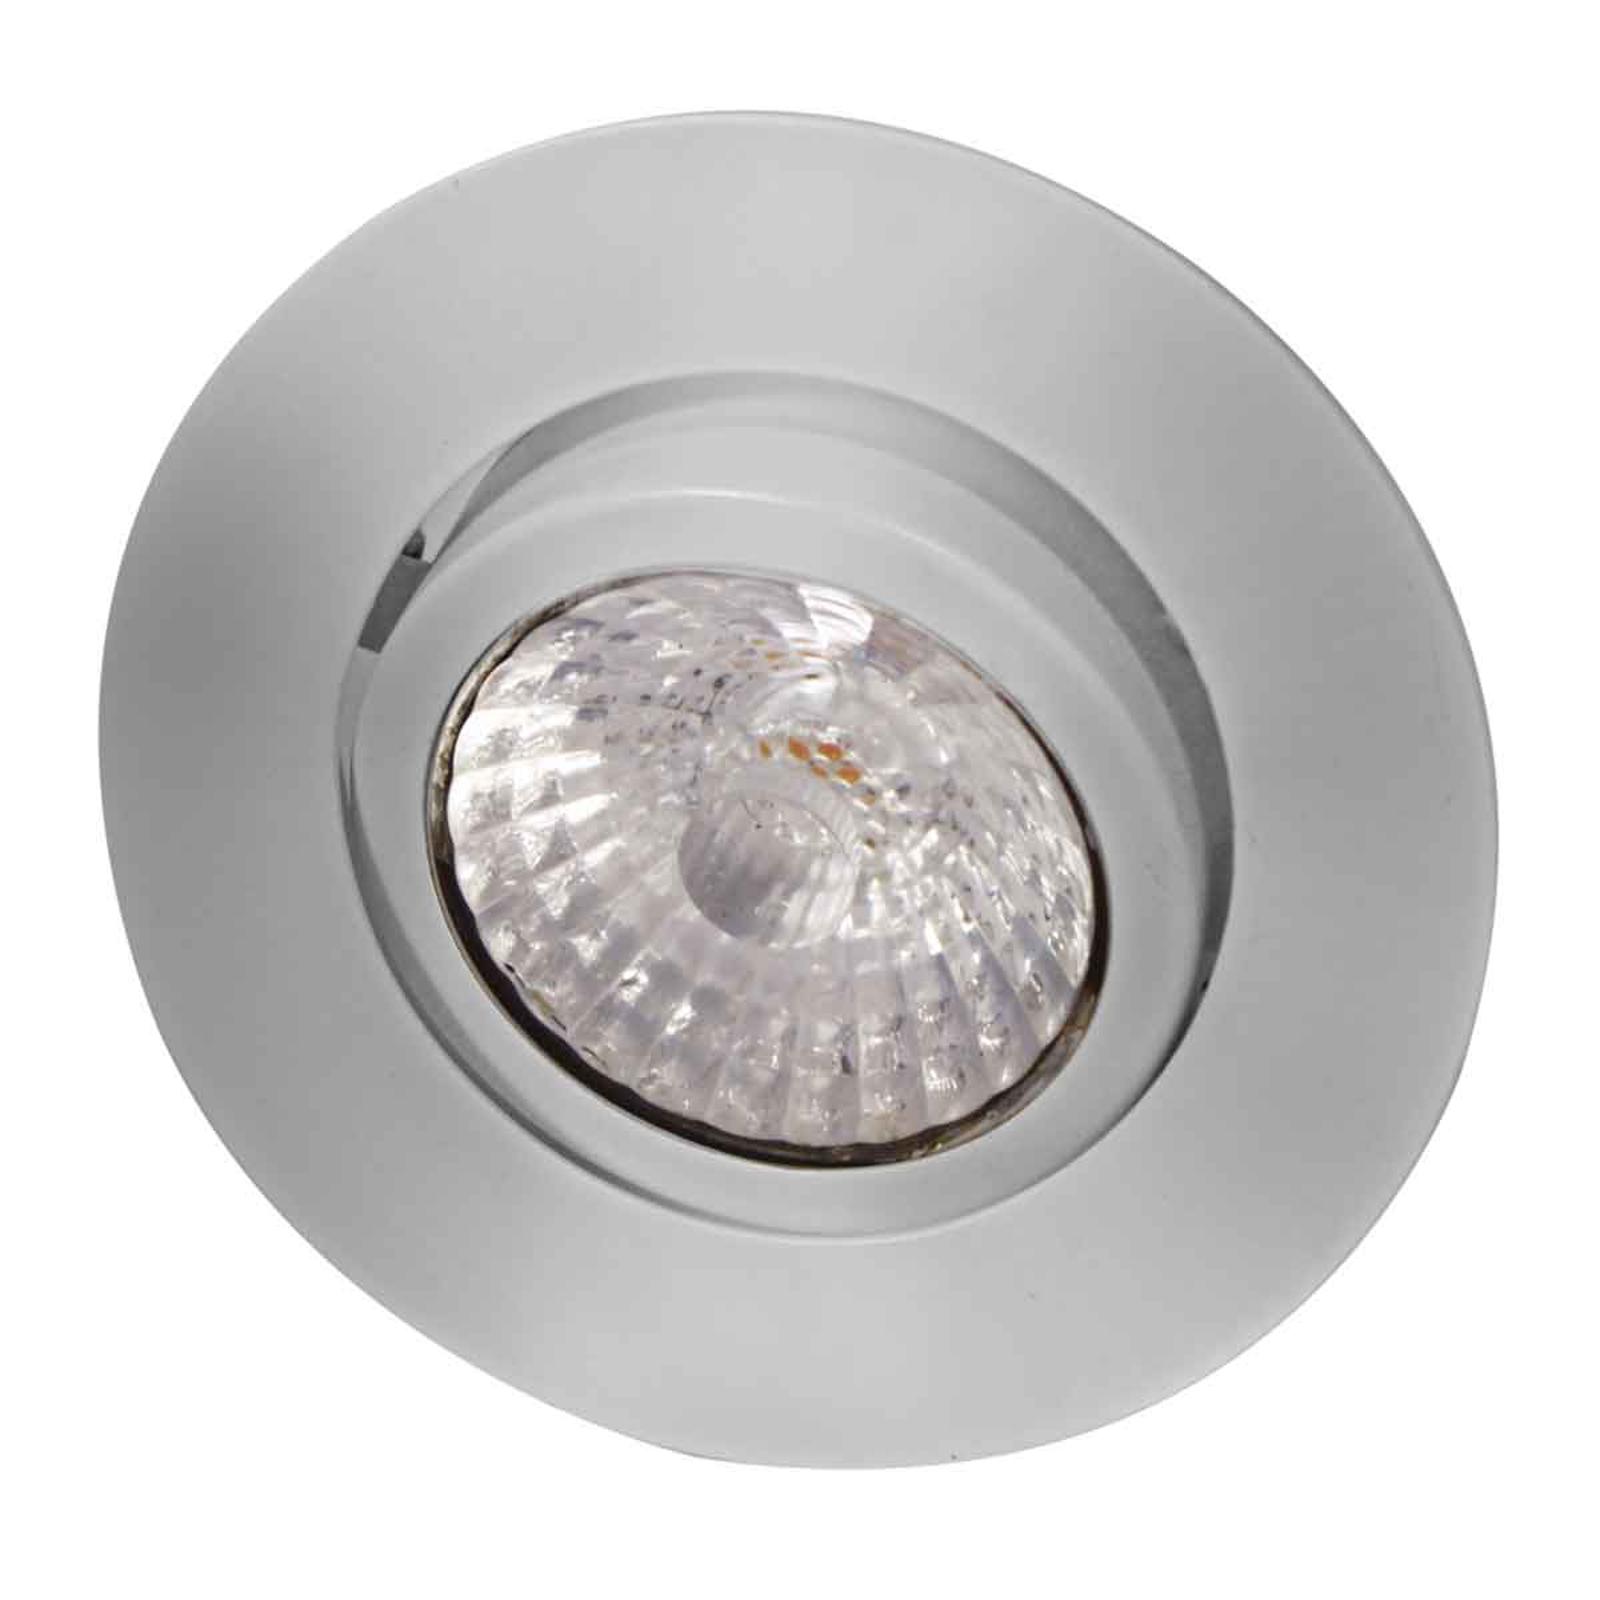 Rico - LED-kattouppokohdevalaisin 9W, harj. teräs